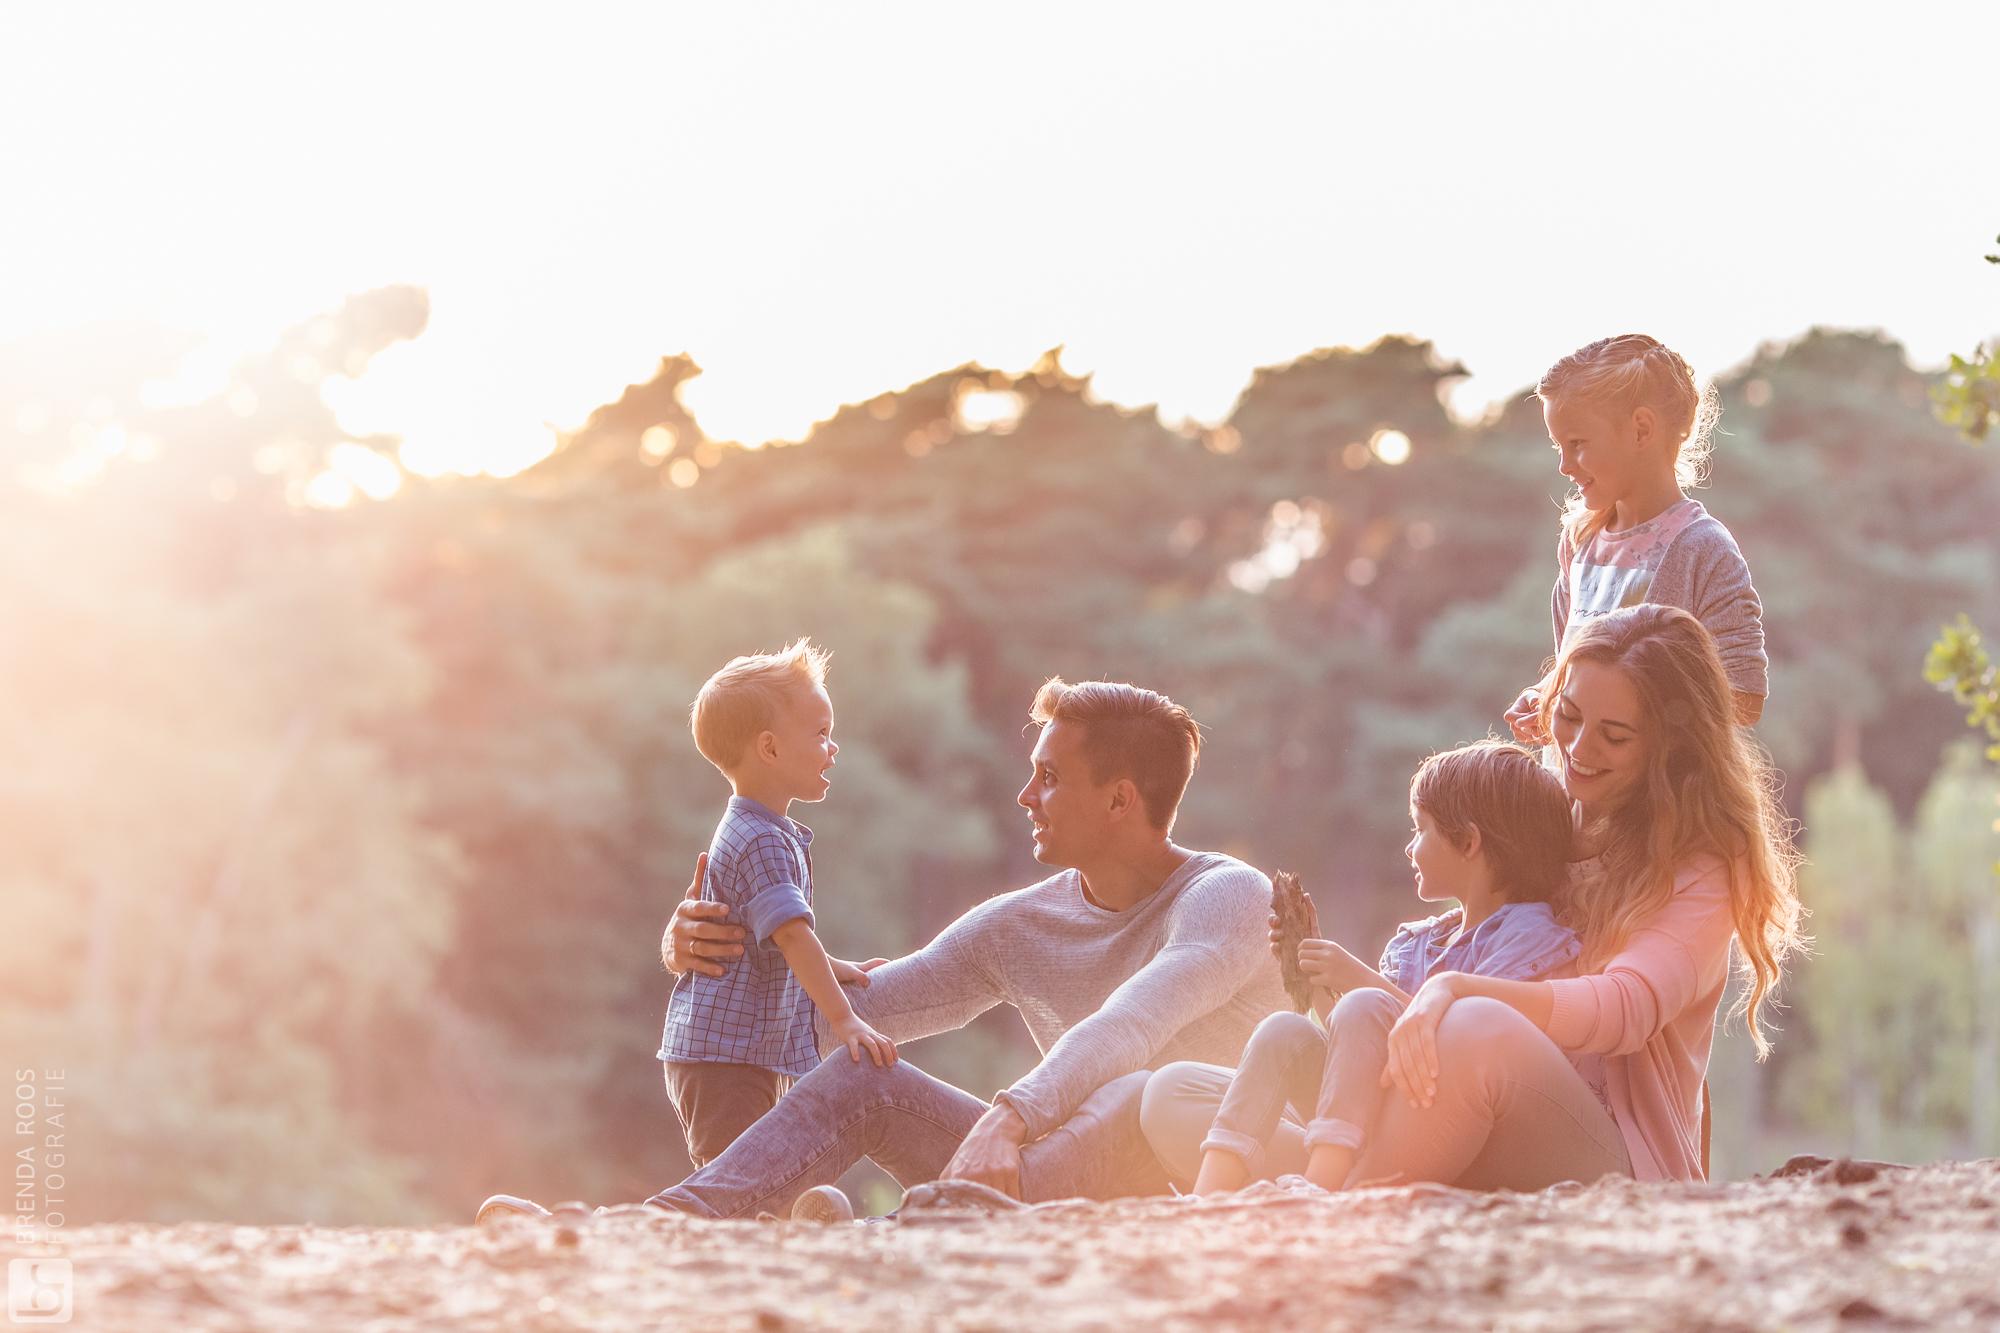 Zomeravond fotoshoot met gezin